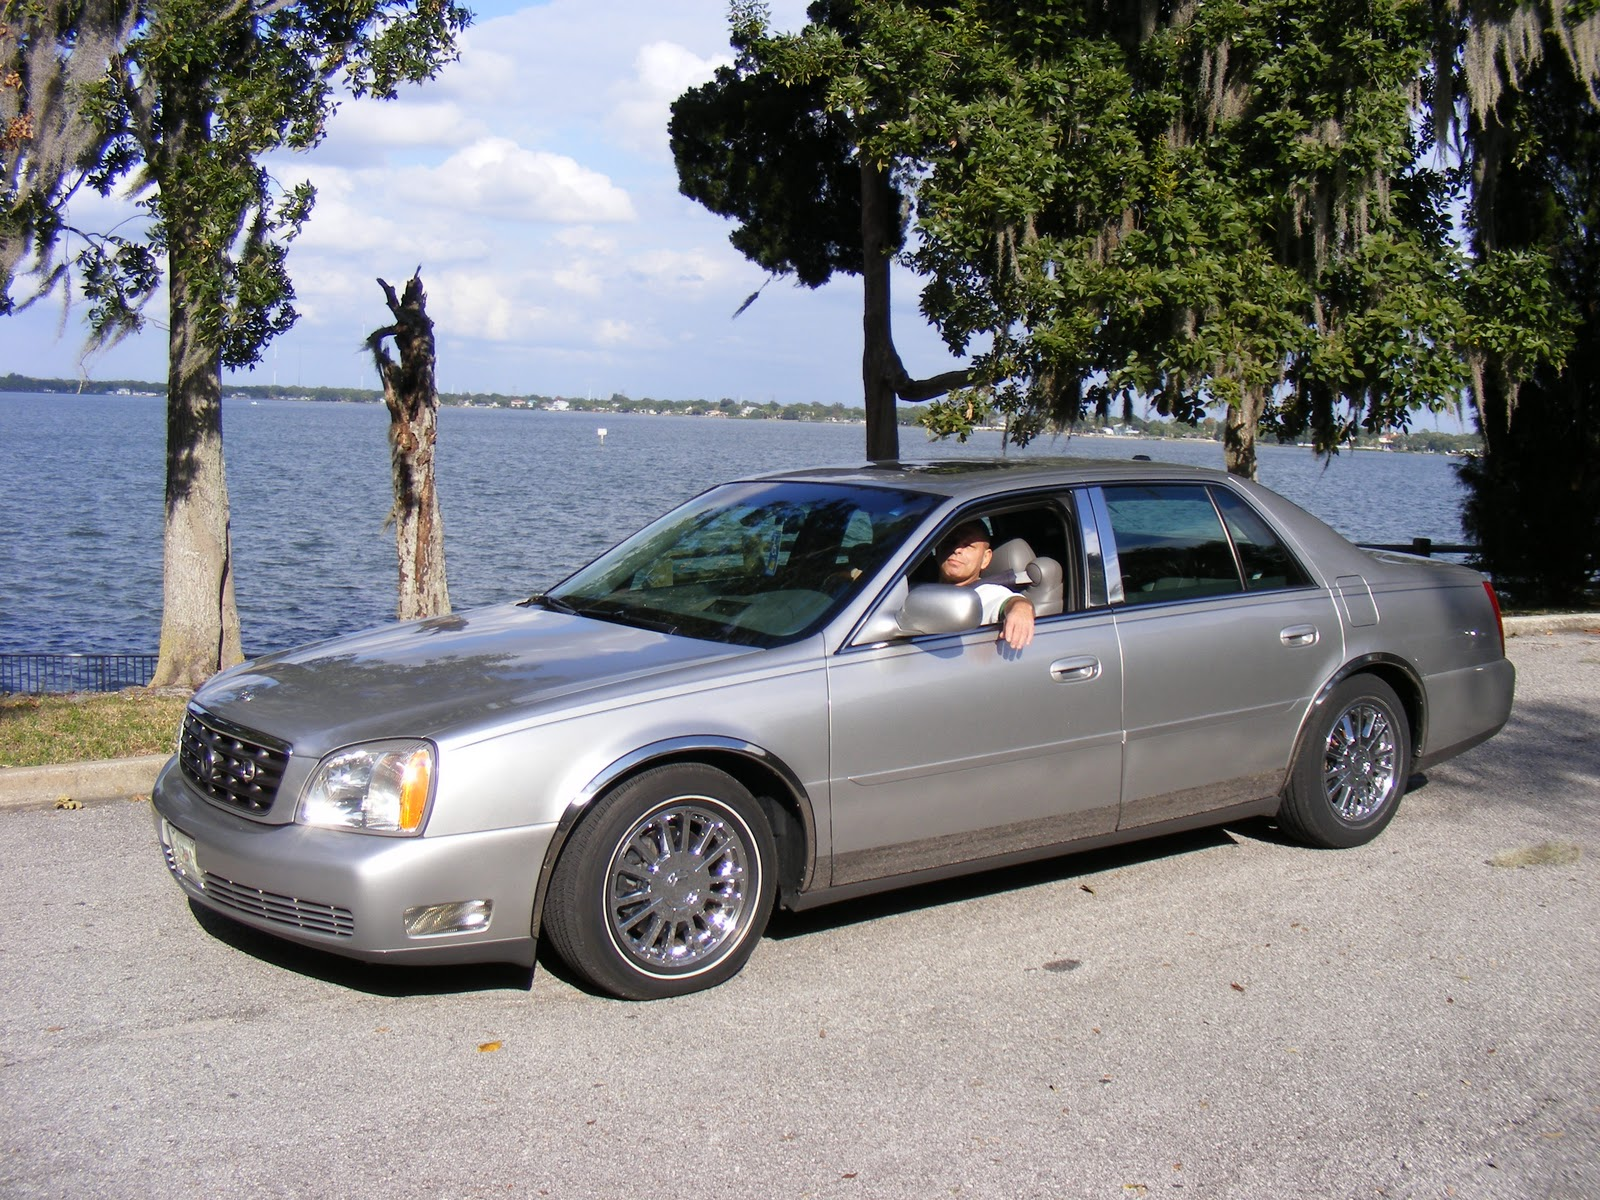 Florida Suncoast Region Cadillac LaSalle Club: November 2010